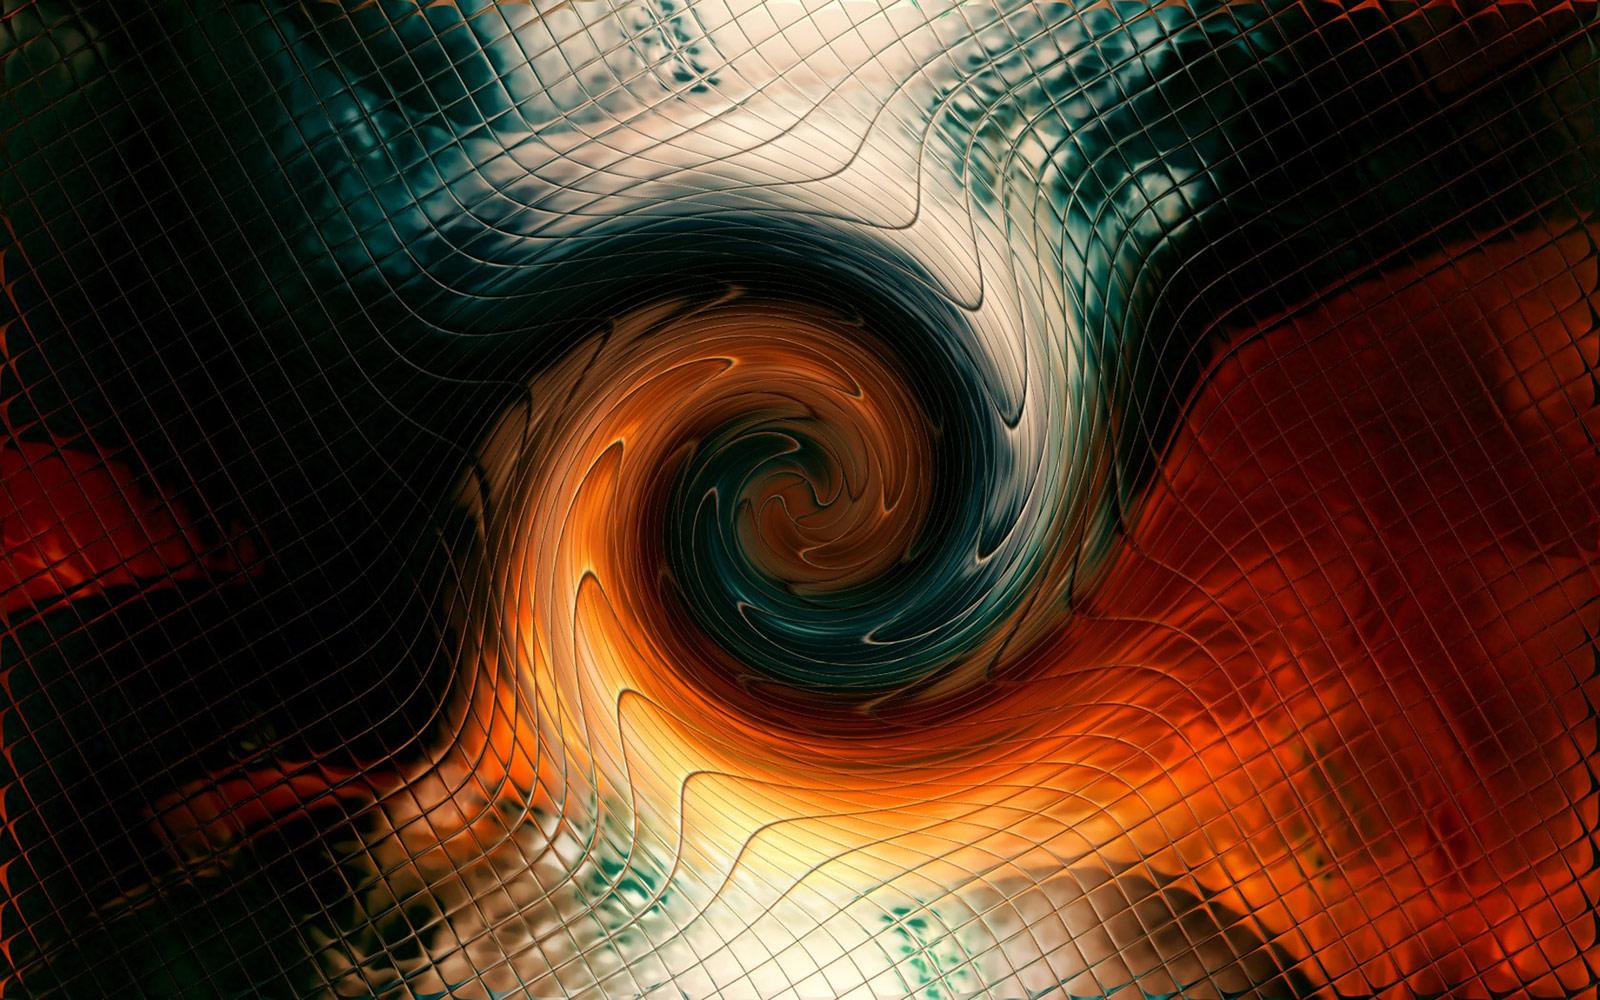 http://1.bp.blogspot.com/_wNRrISXI7pU/S7wSxGPi_3I/AAAAAAAAACw/NXzx9bmJNqc/s1600/Whirl_Hole_-_Swirling_Motion.jpg